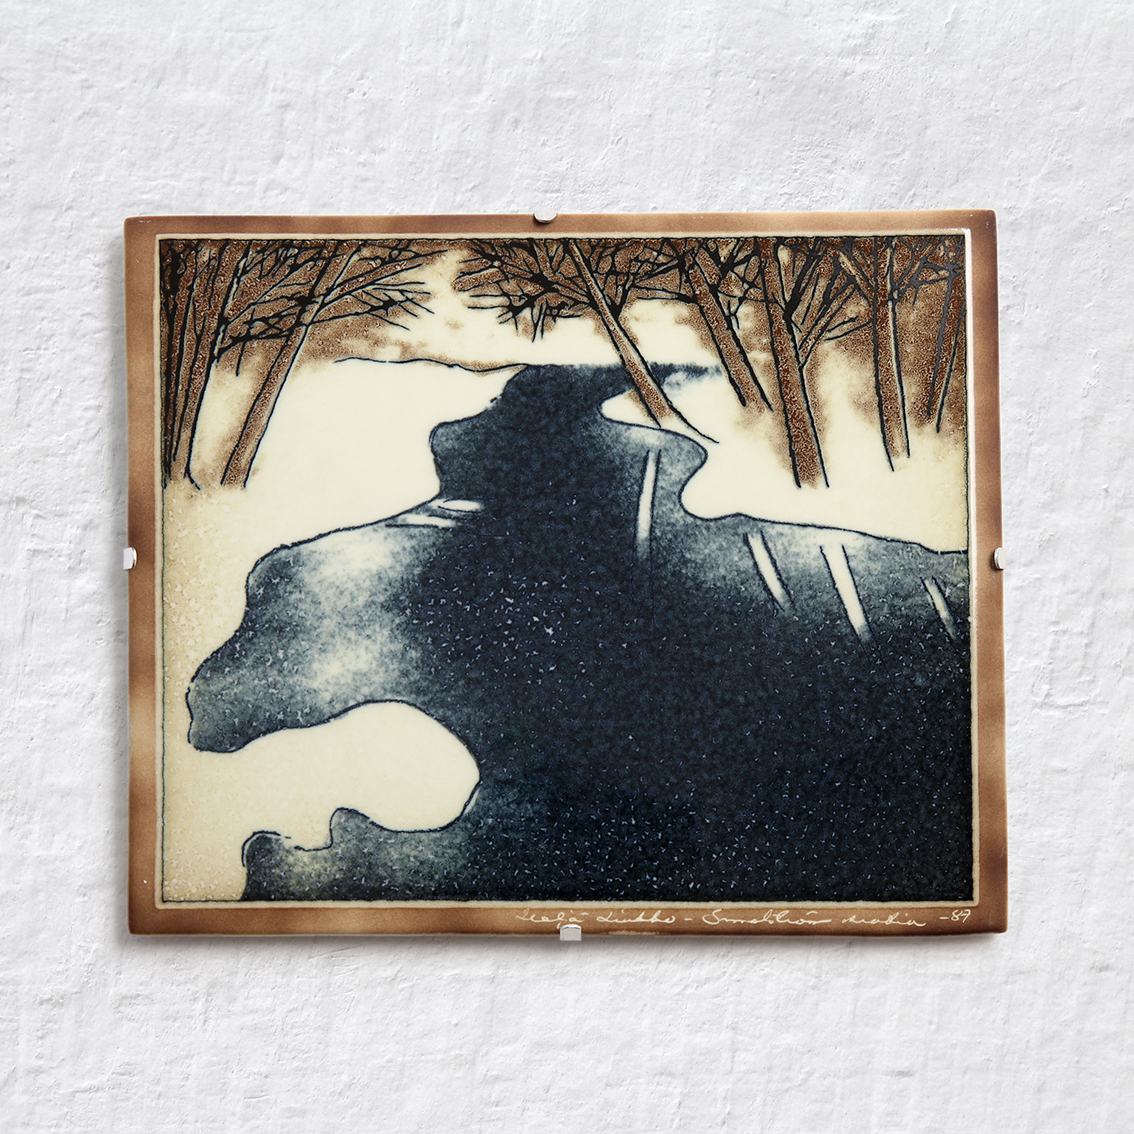 ARABIA アラビア Helja Liukko-Sundstrom ヘルヤ リウッコ スンドストロム 川の陶板(オリジナル紙箱入り) 北欧ヴィンテージ